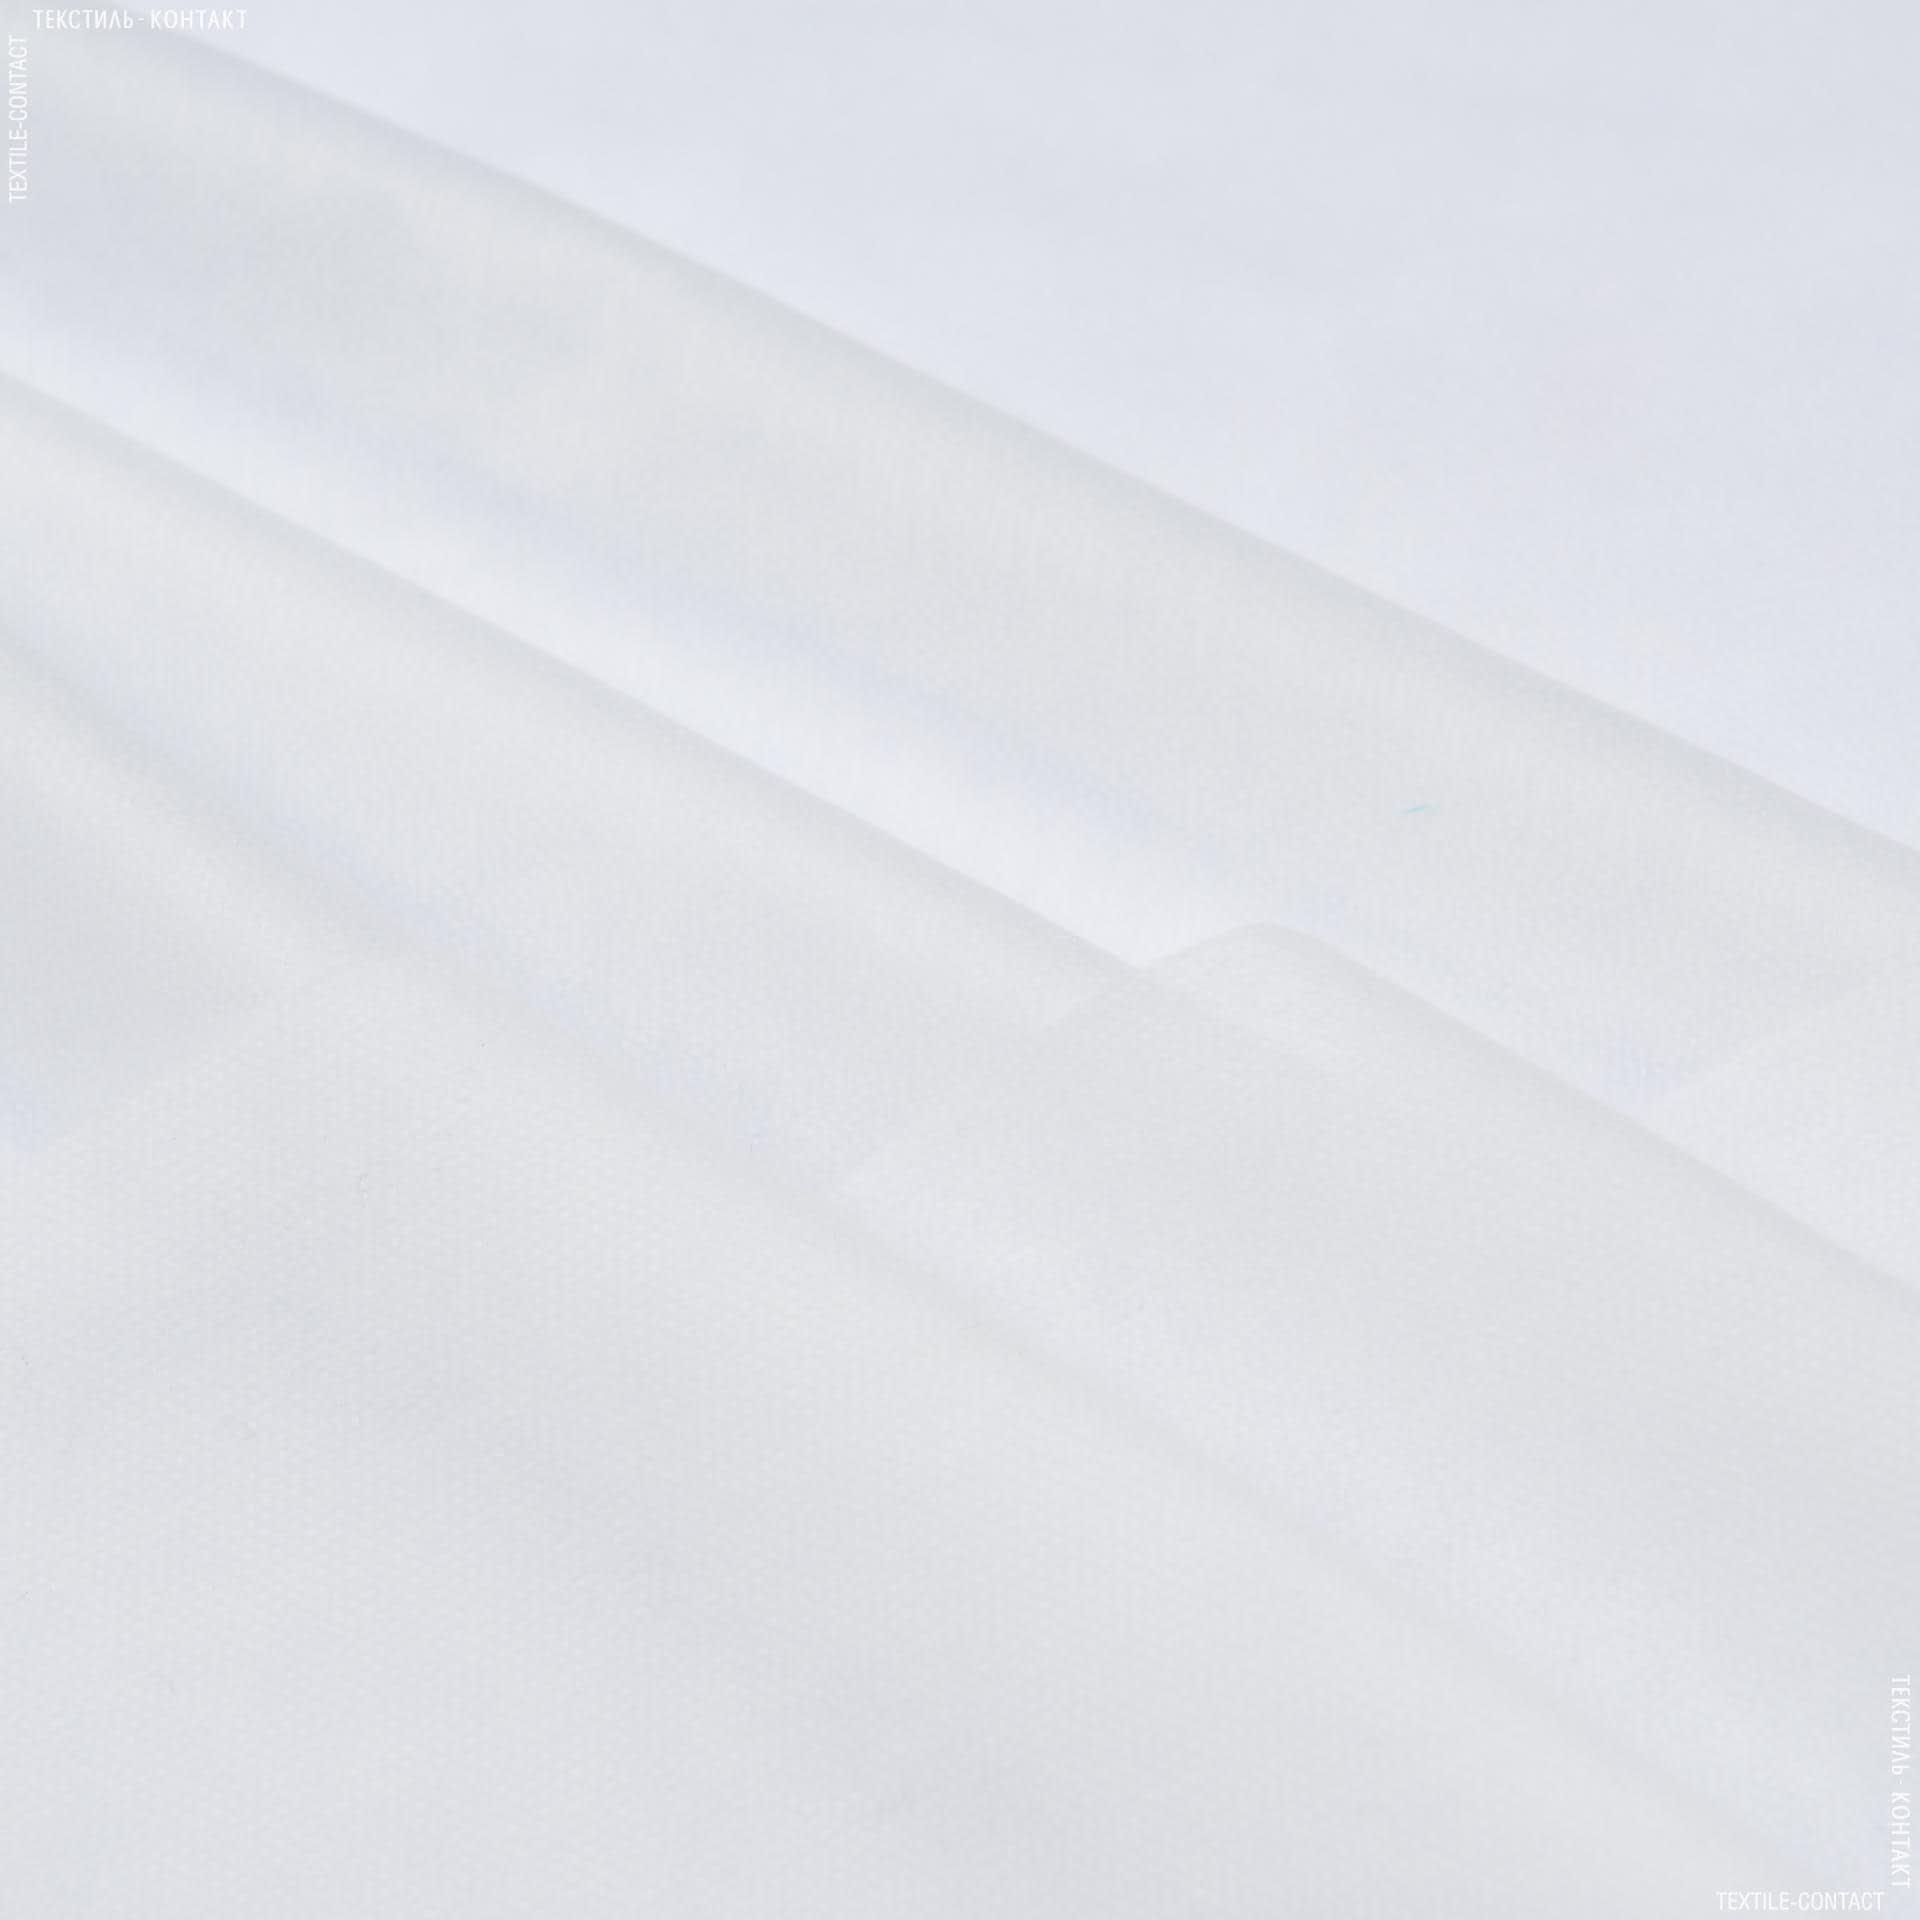 Ткани дублирин, флизелин - Флизелин клеевой точечный белый 35г/м